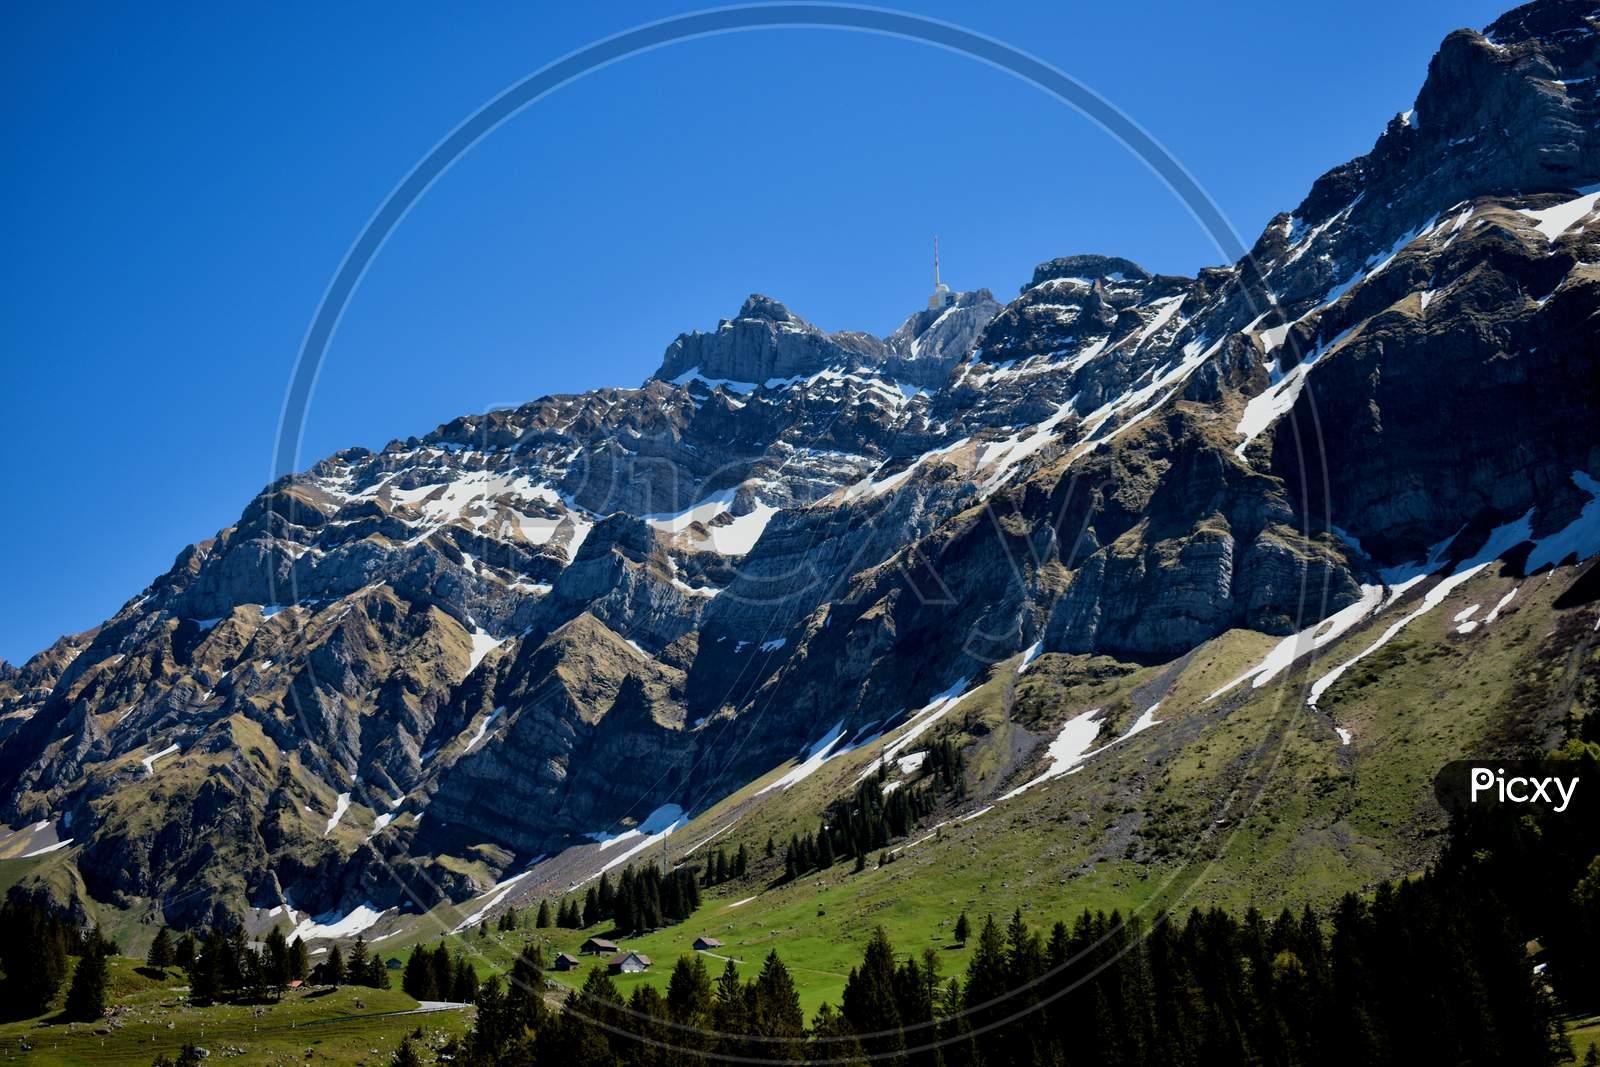 Peak of the mount Säntis in the Alpstein mountains in Switzerland 7.5.2020